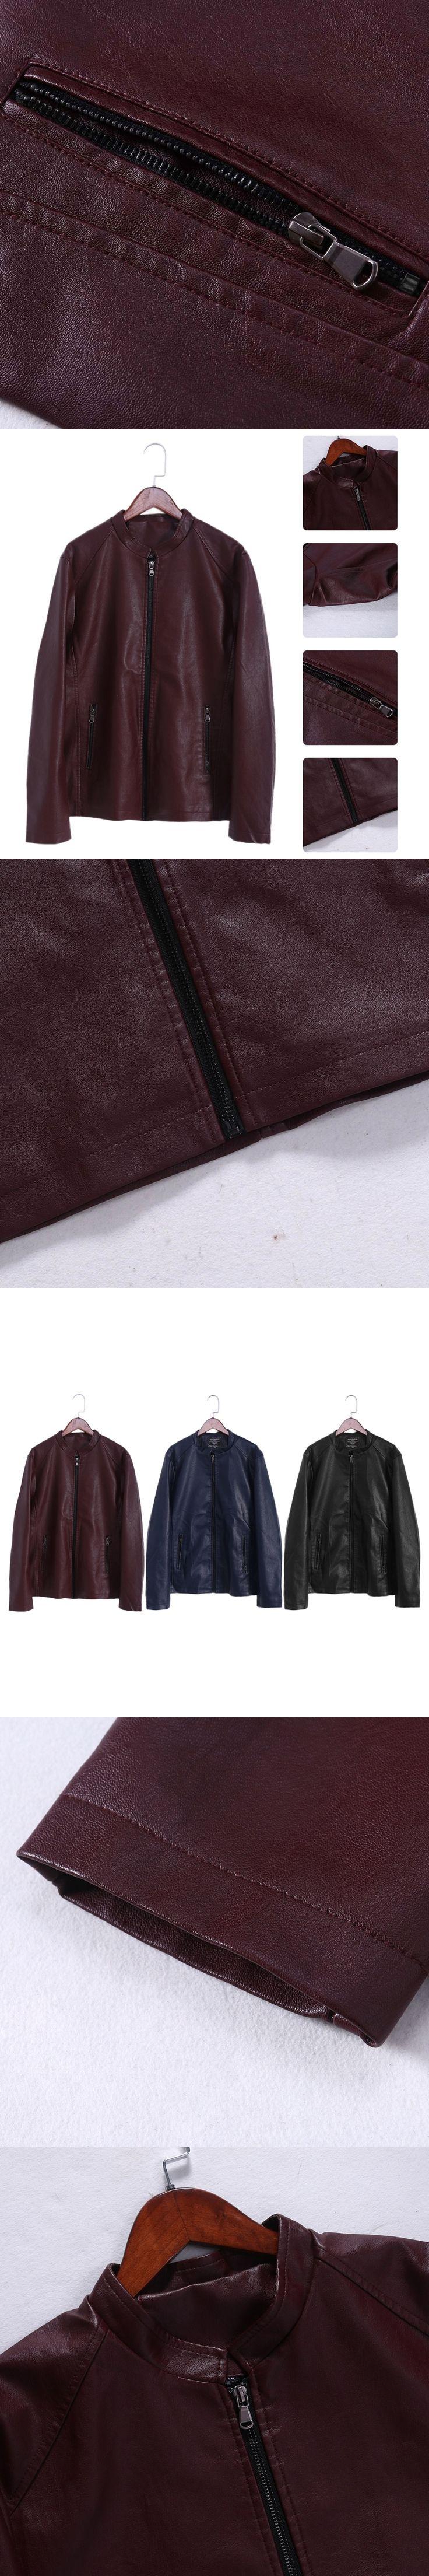 Men's Faux Leather Jacket Stylish Faux PU Leather Motocycle/Biker/Flight Punk Jacket Slim Fit W730